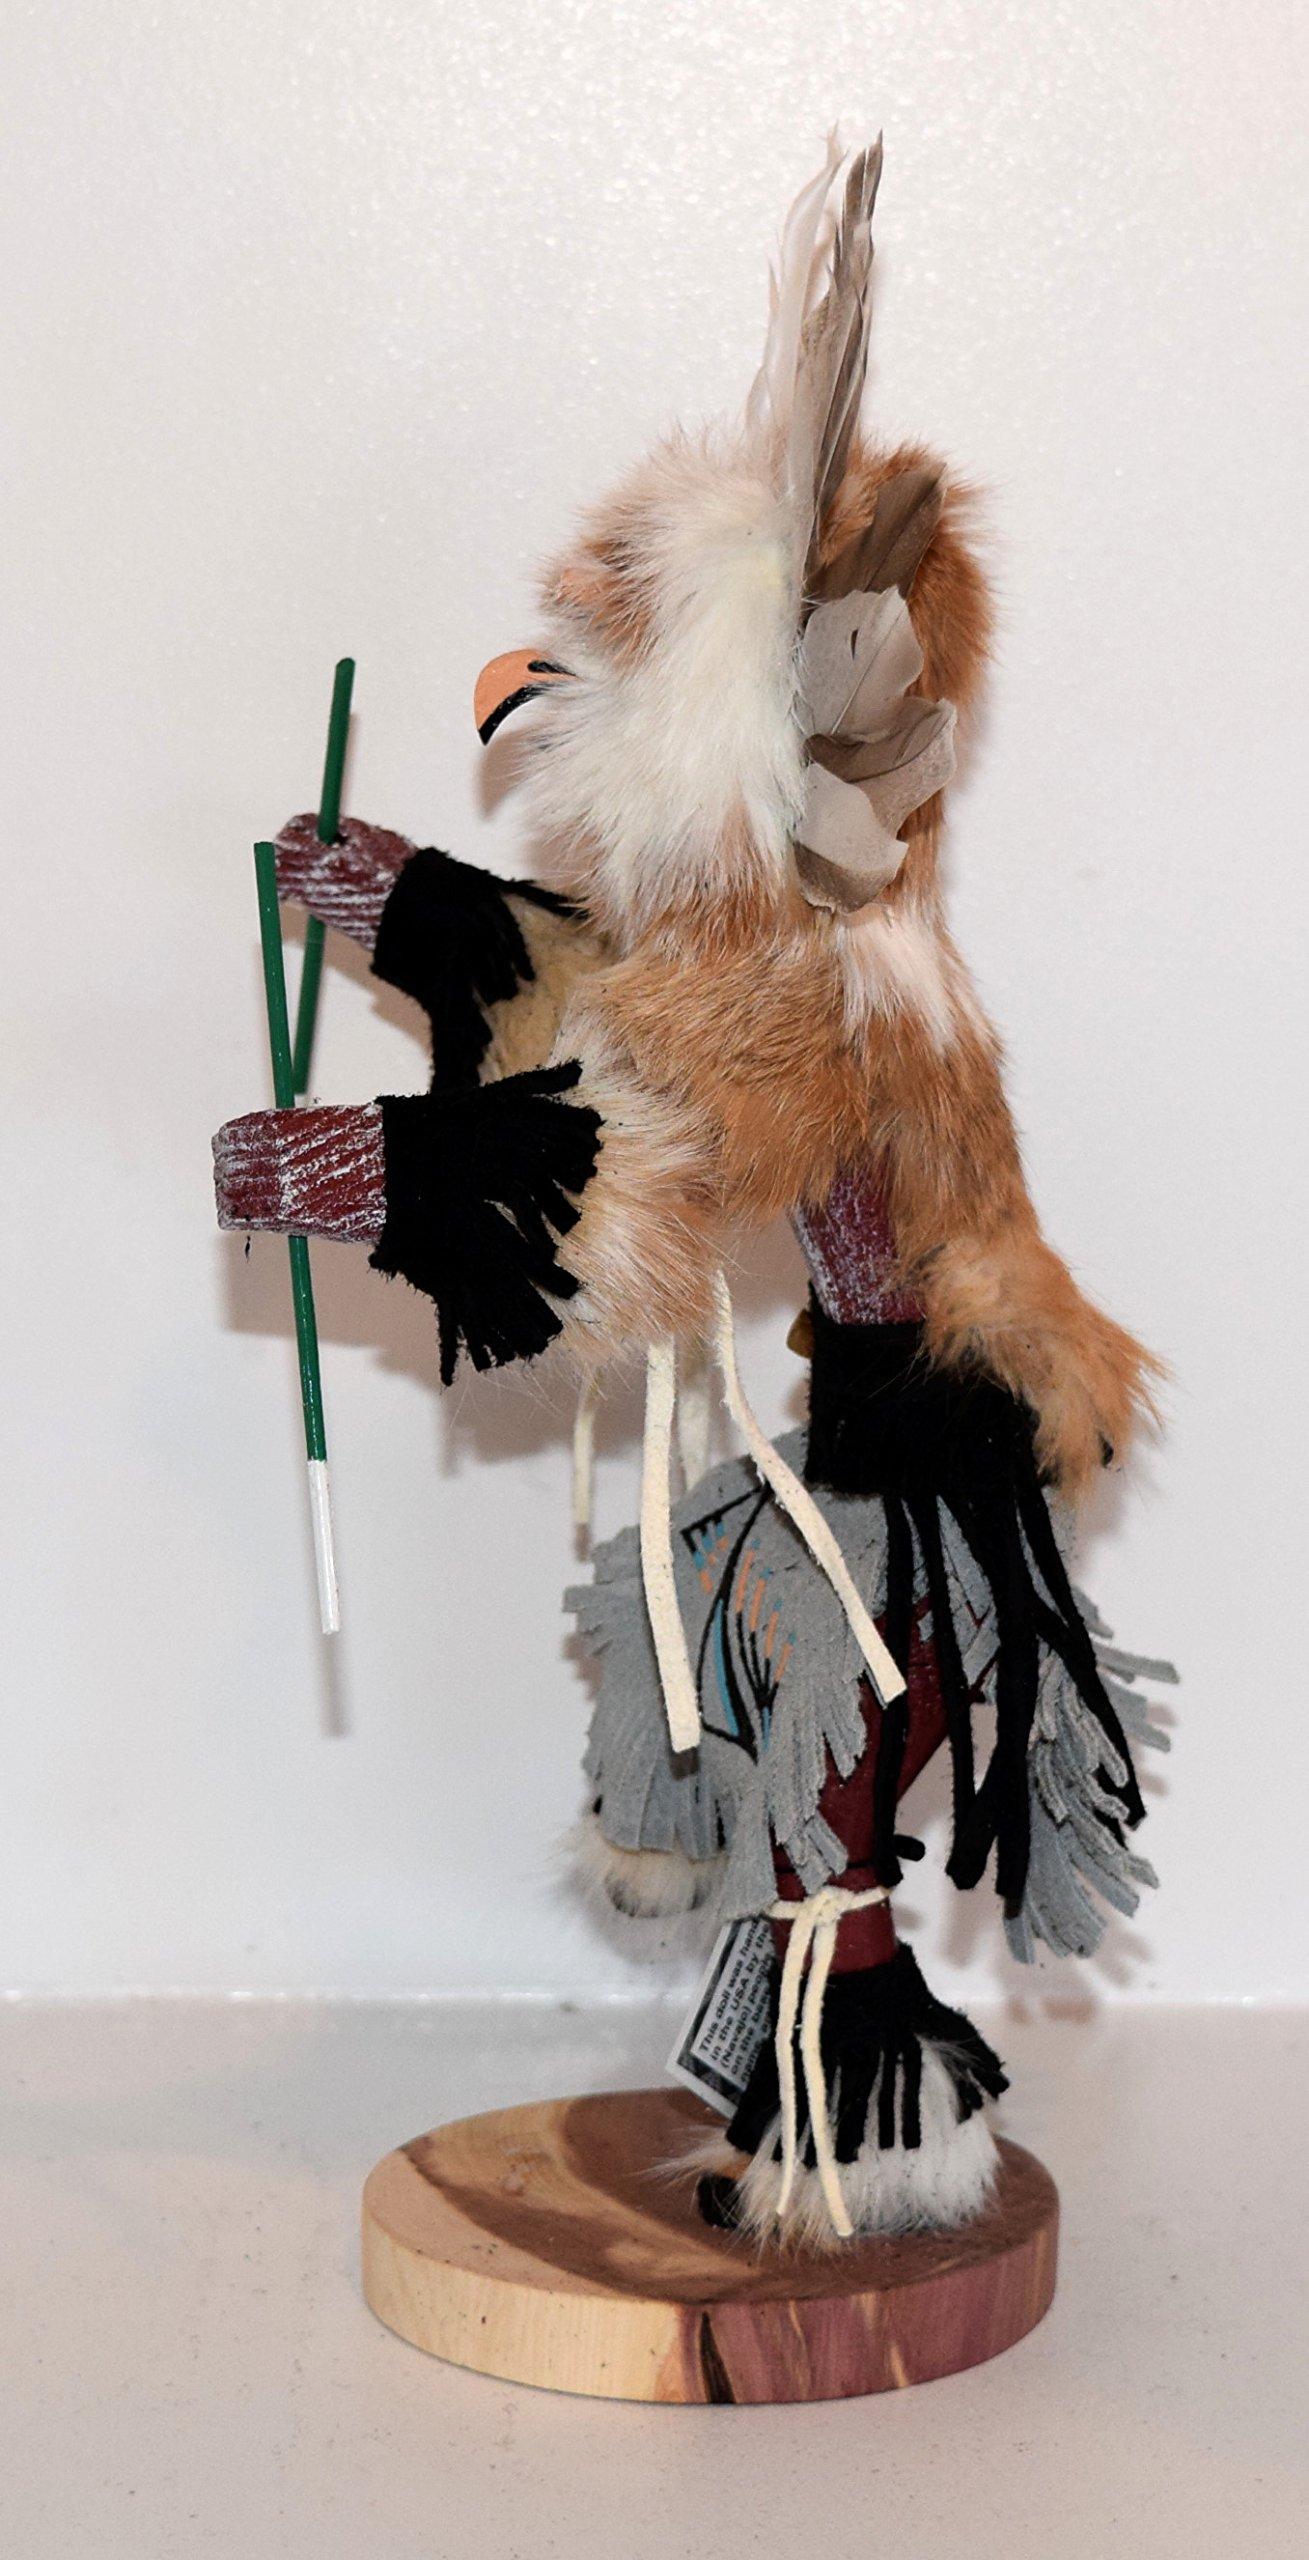 12 INCH Great Horn Owl Kachina by Kachina Country USA (Image #2)